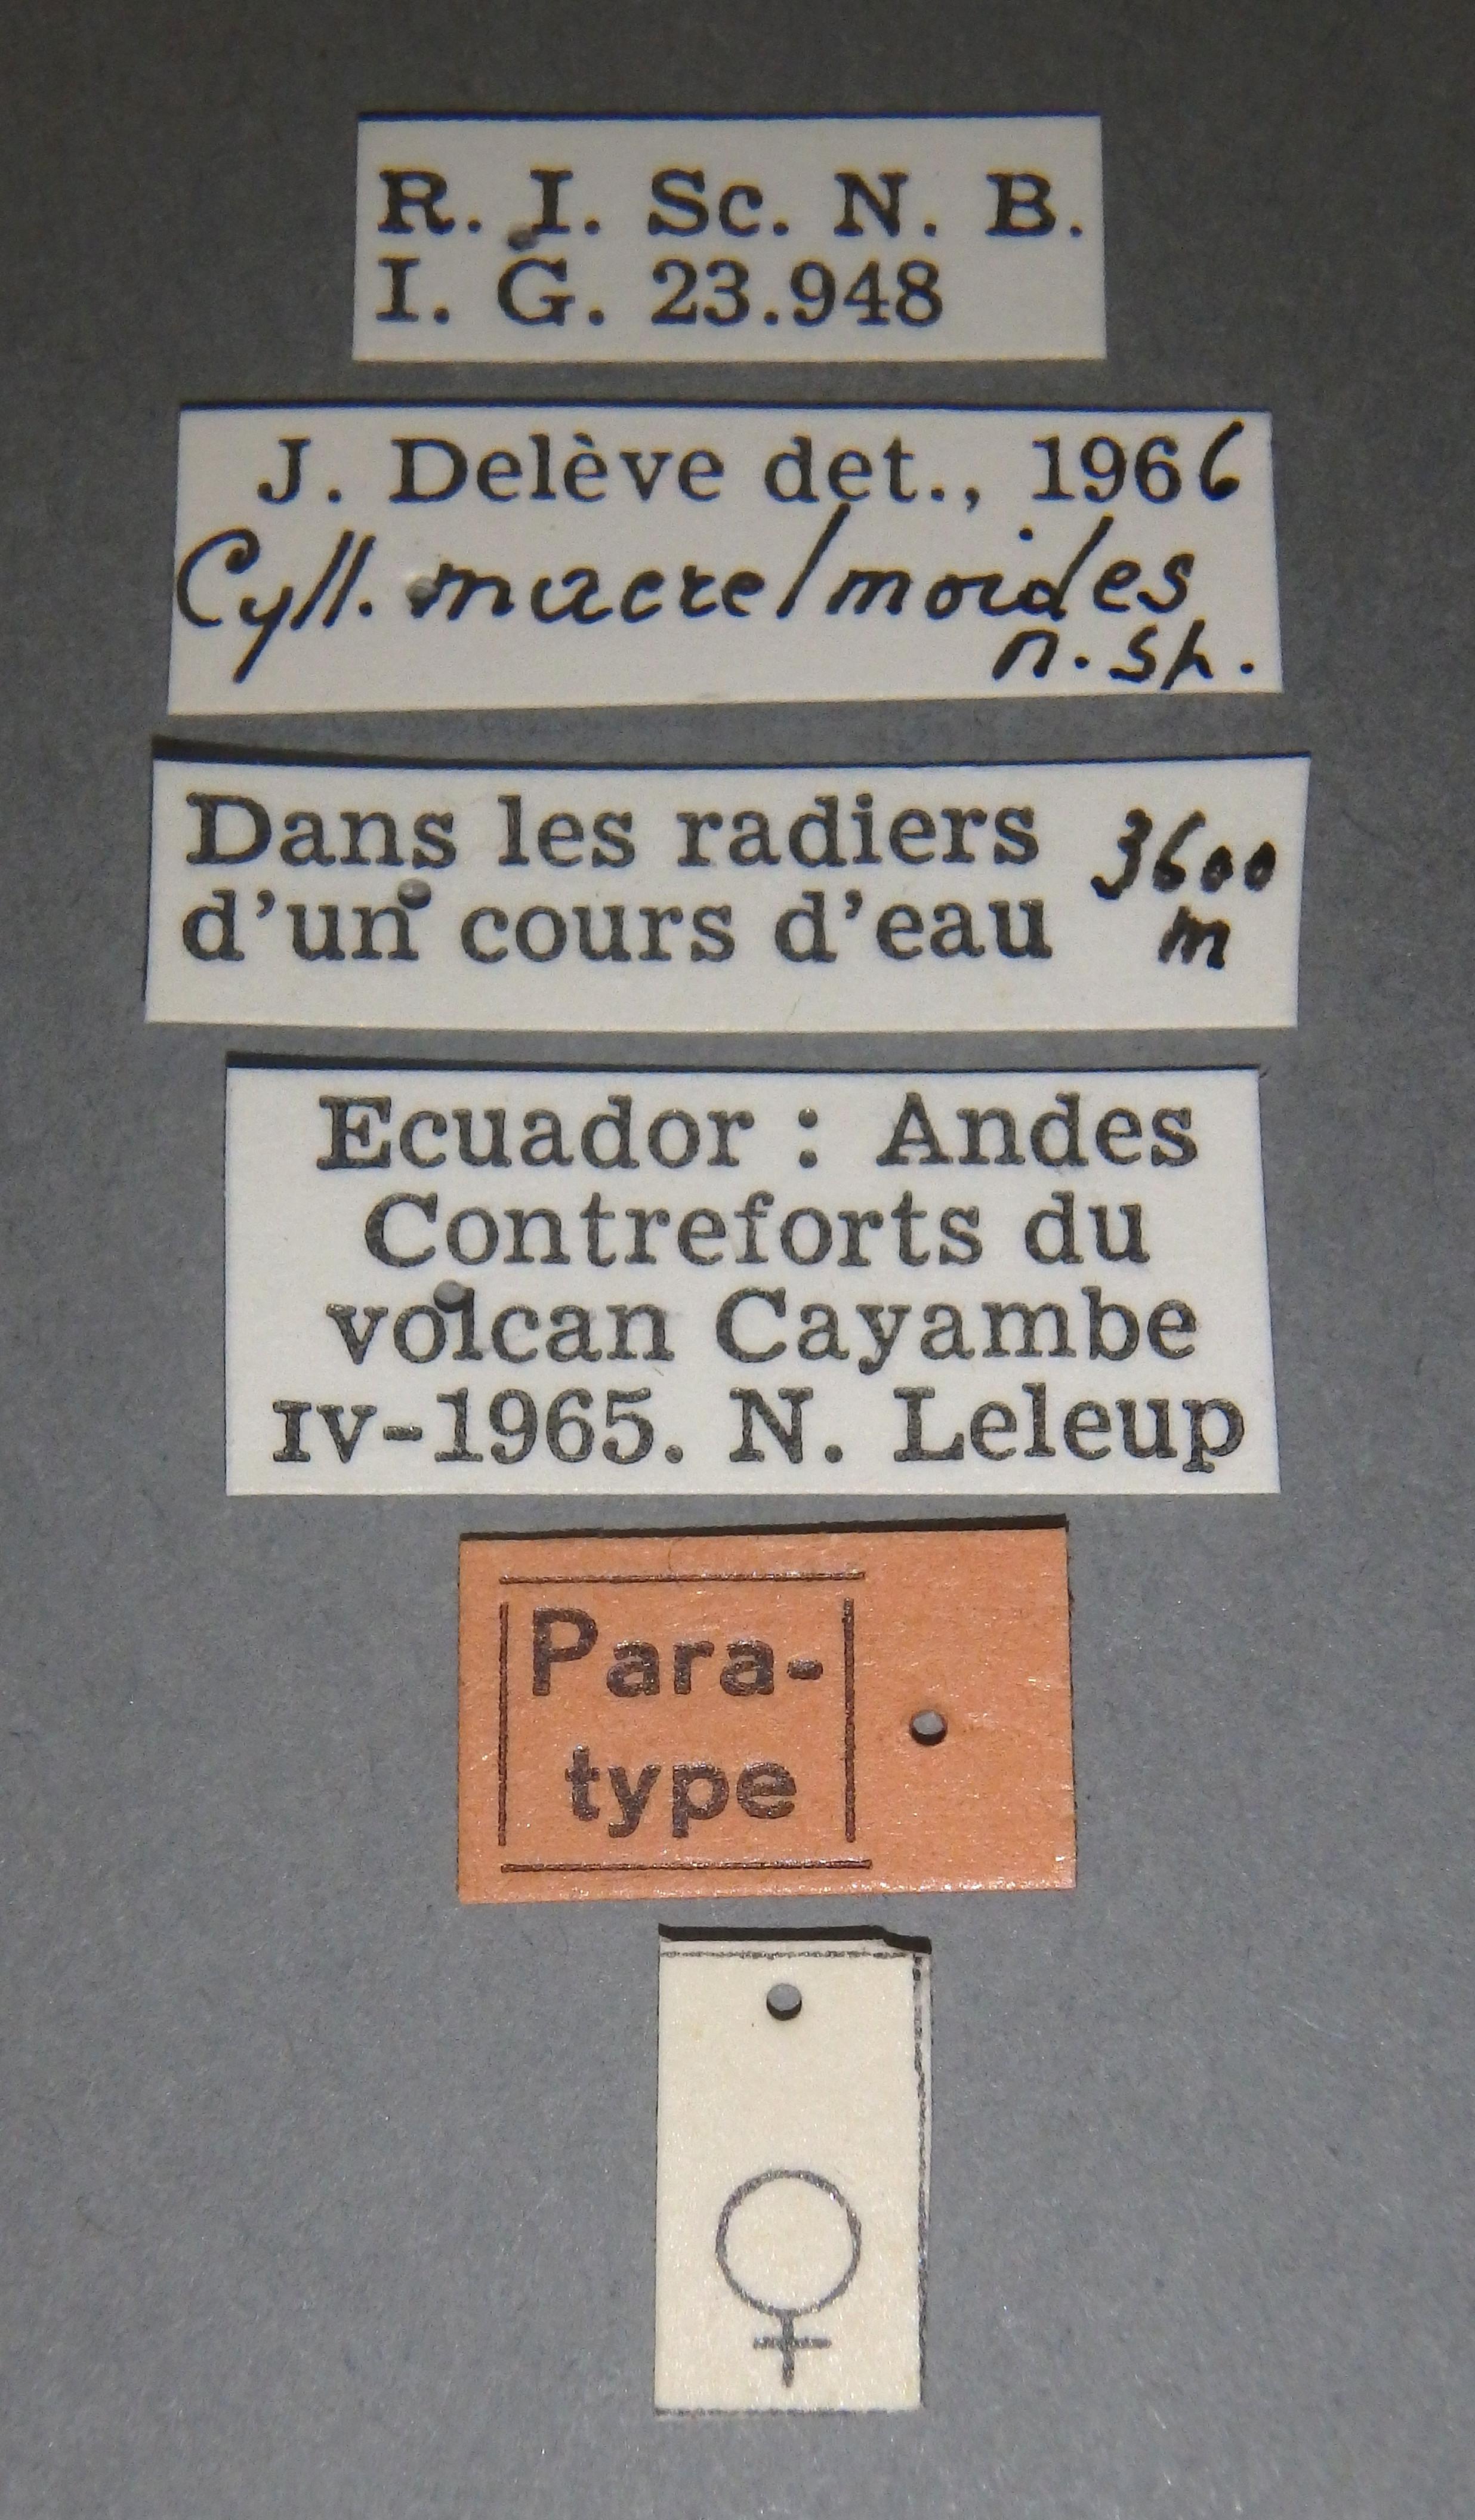 Cylloepus macrelmoides pt F Lb.JPG